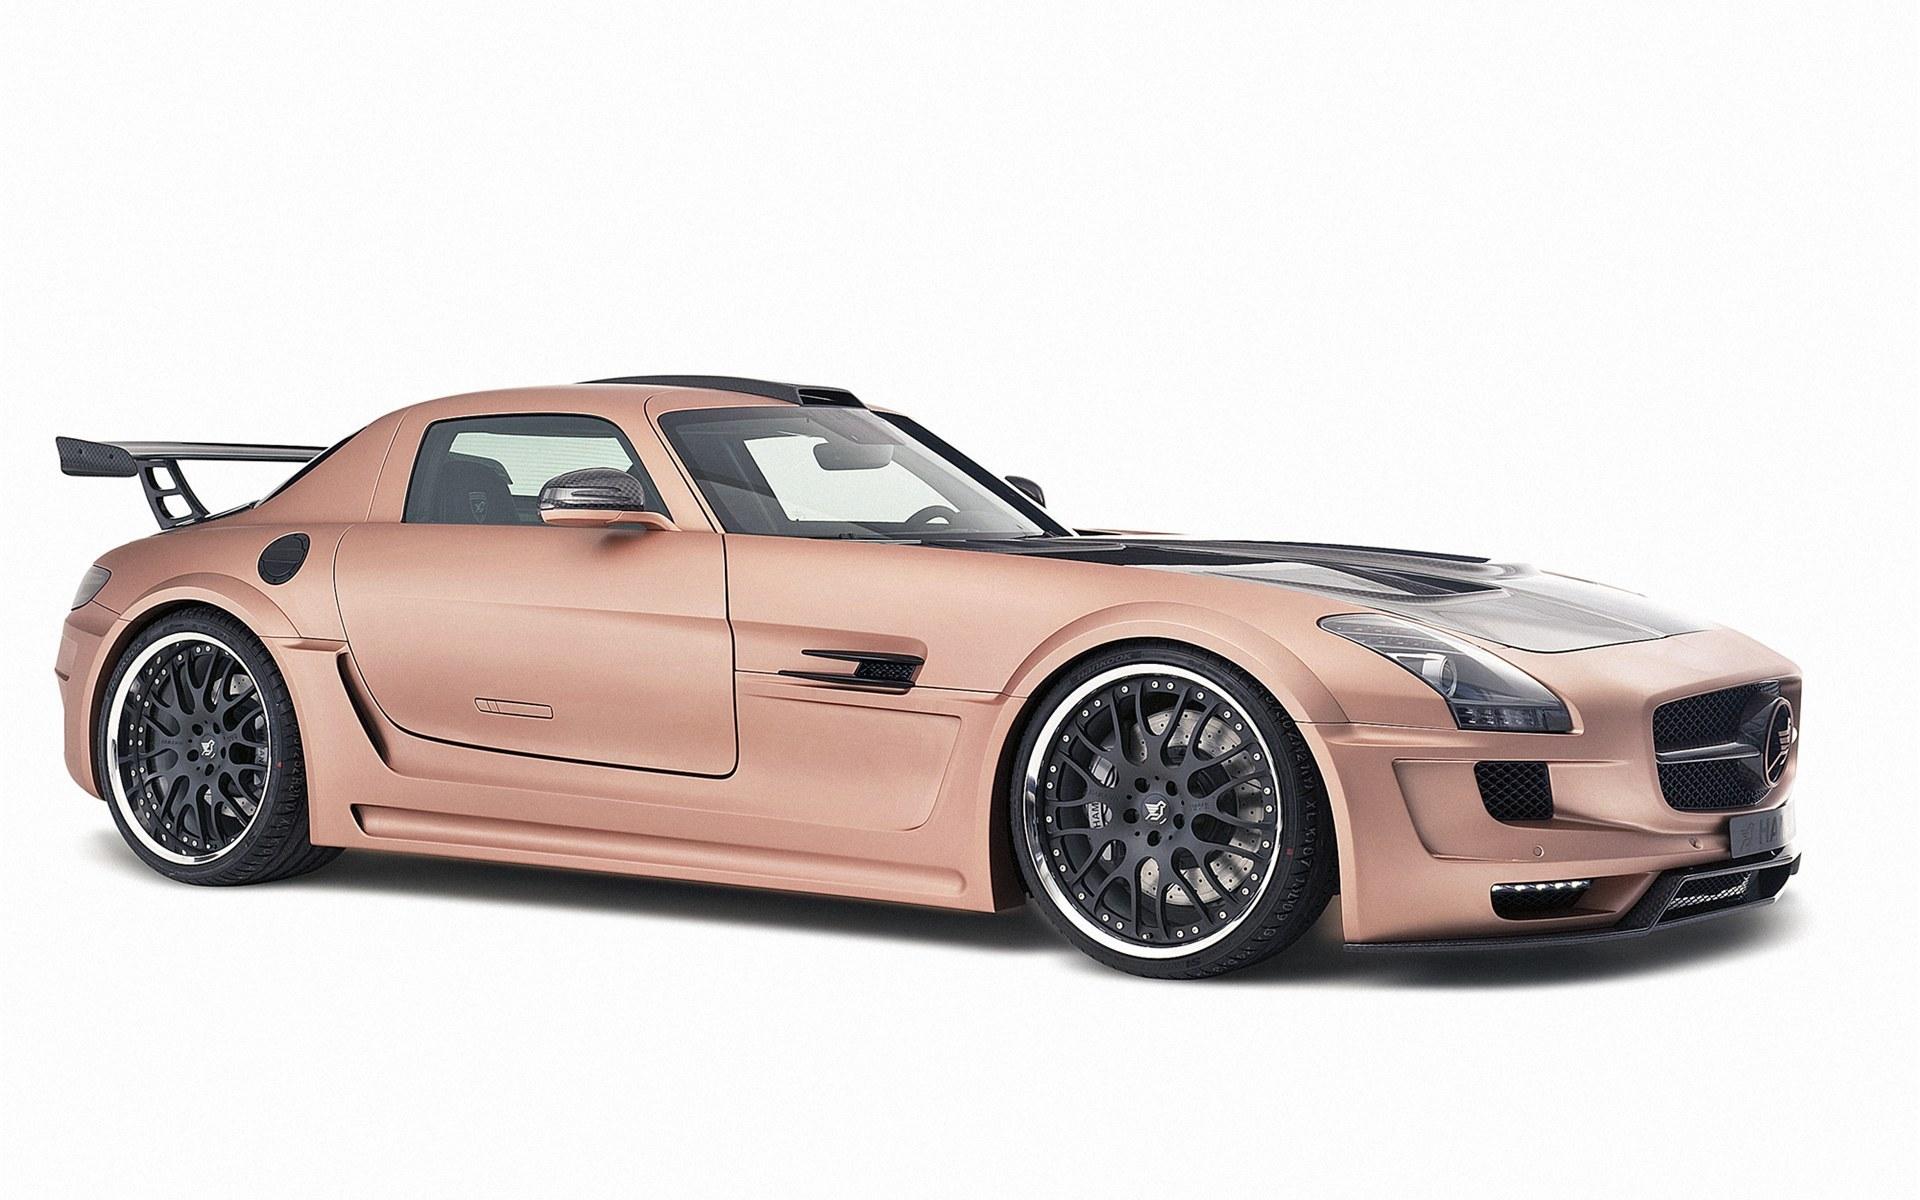 Hamman Mercedes Benz Car Hd Wallpaper For Desktop My Site